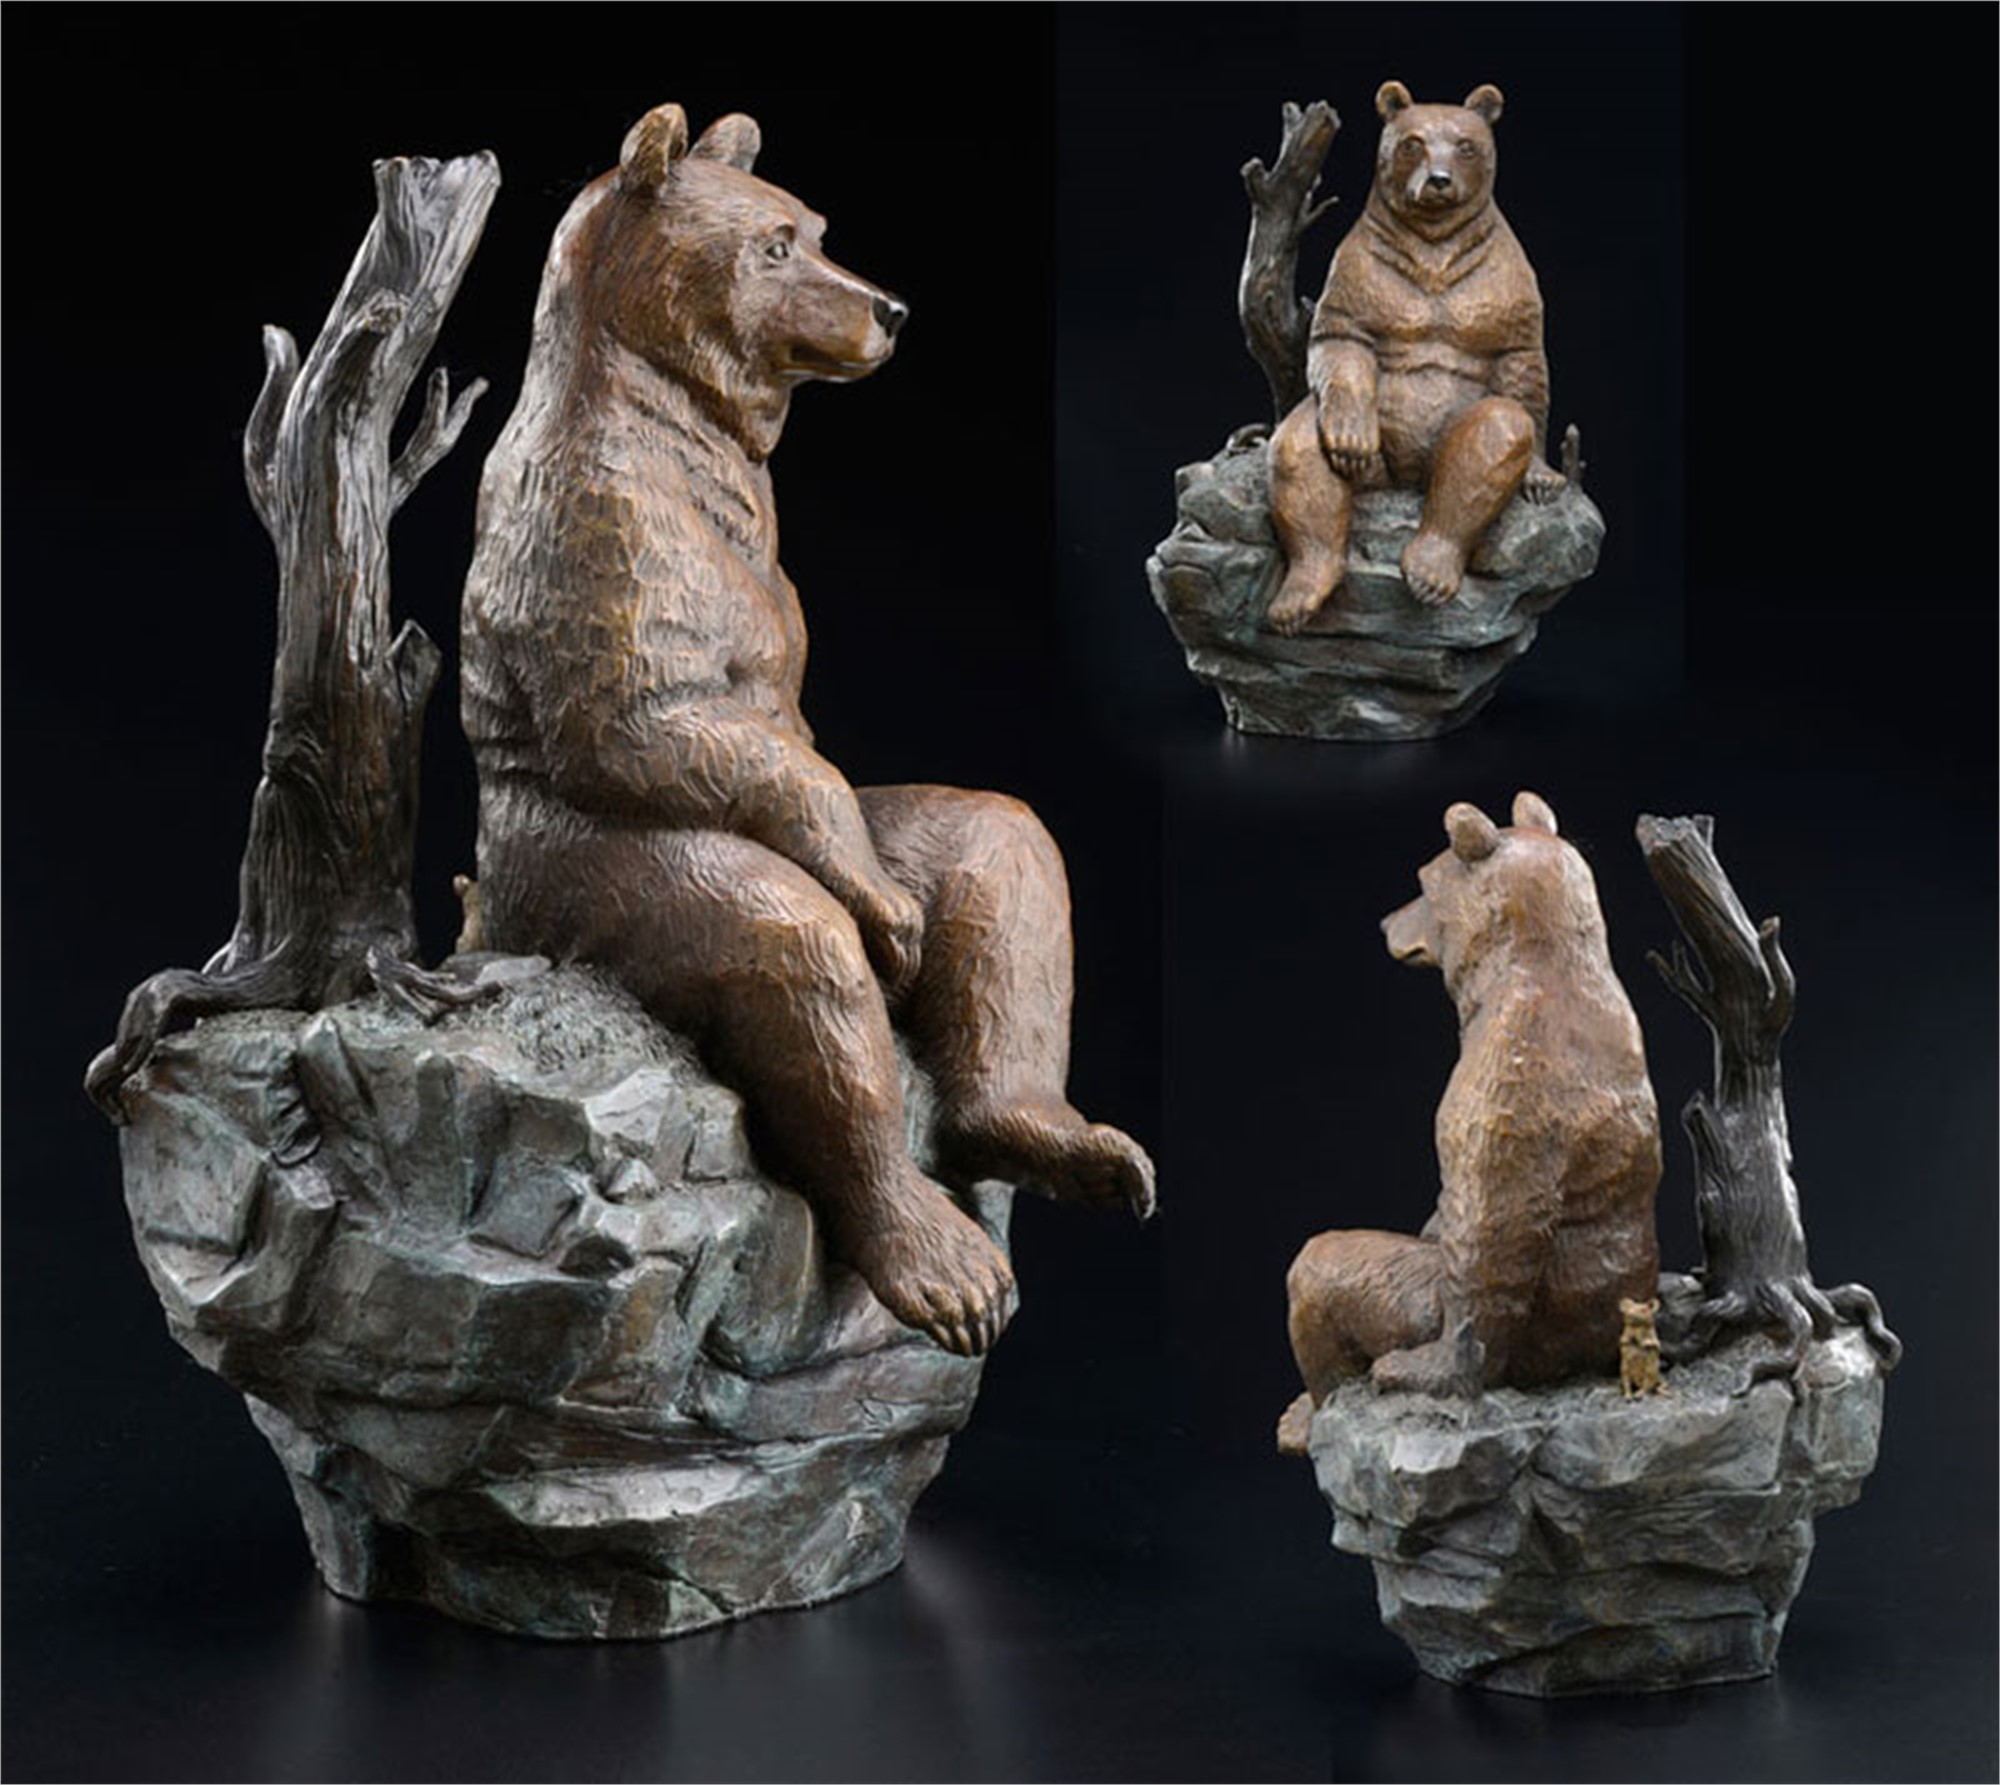 Contemplation (Sculpture) by Robert Bissell